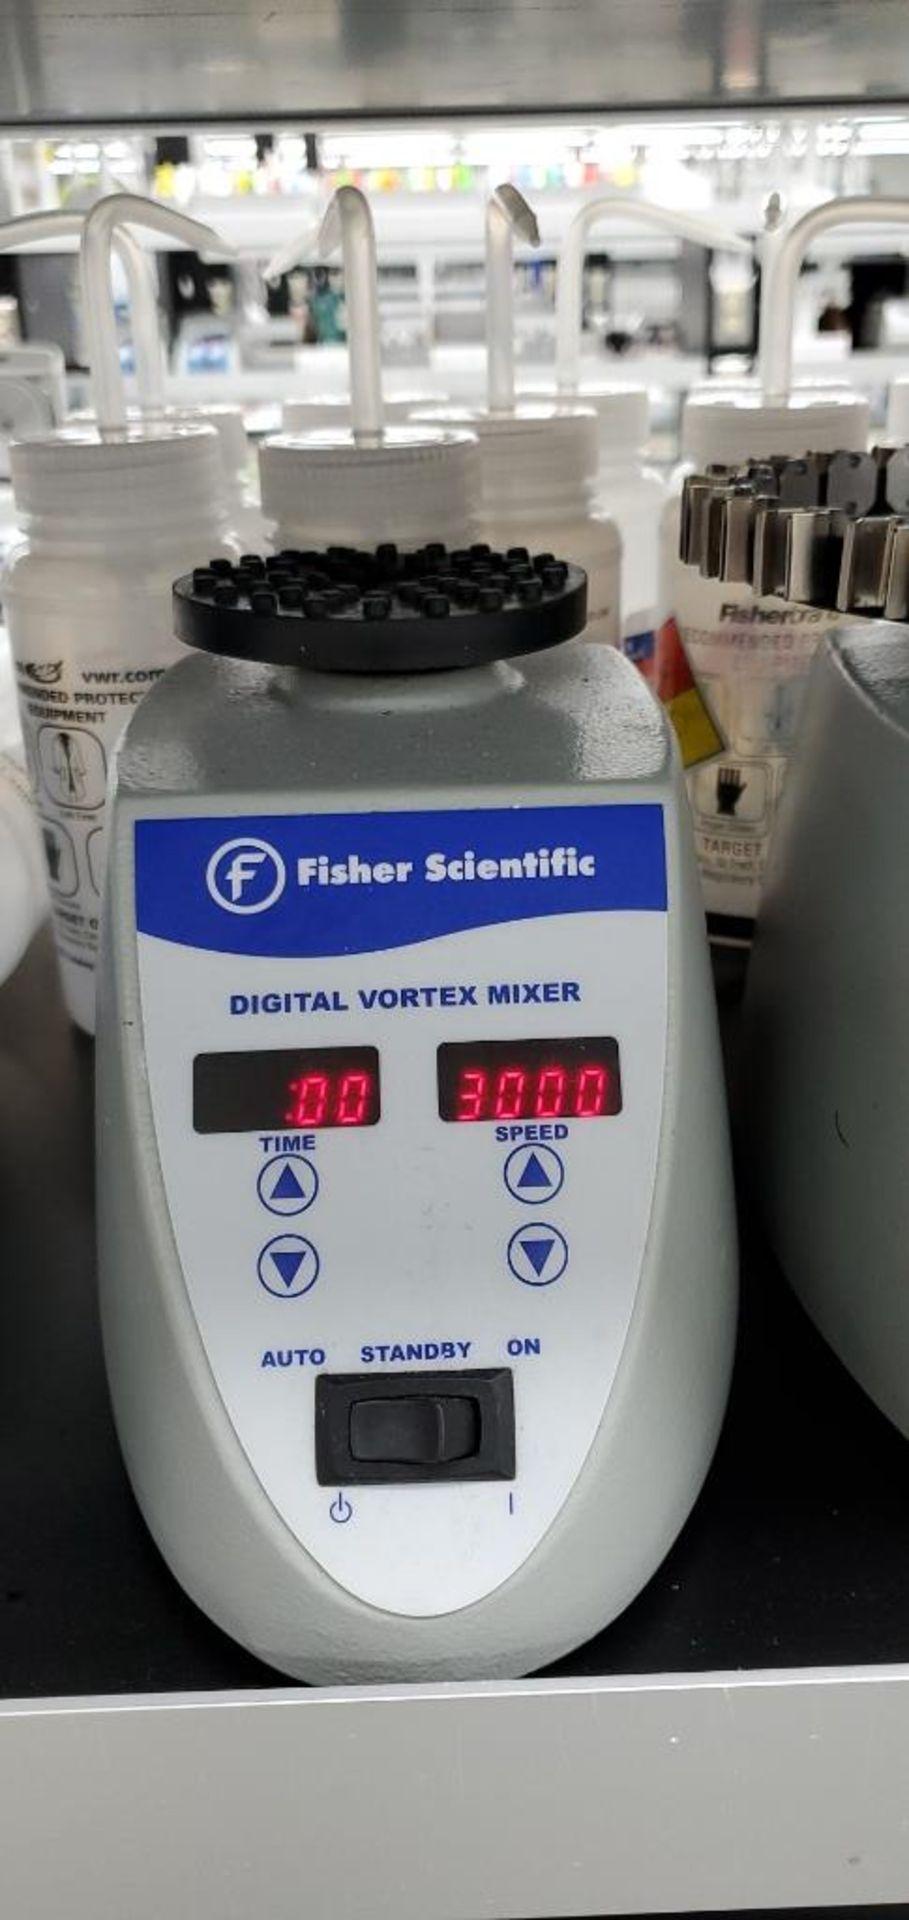 Lot 7 - (2) Fisher Scientific Digital Vortex Mixers